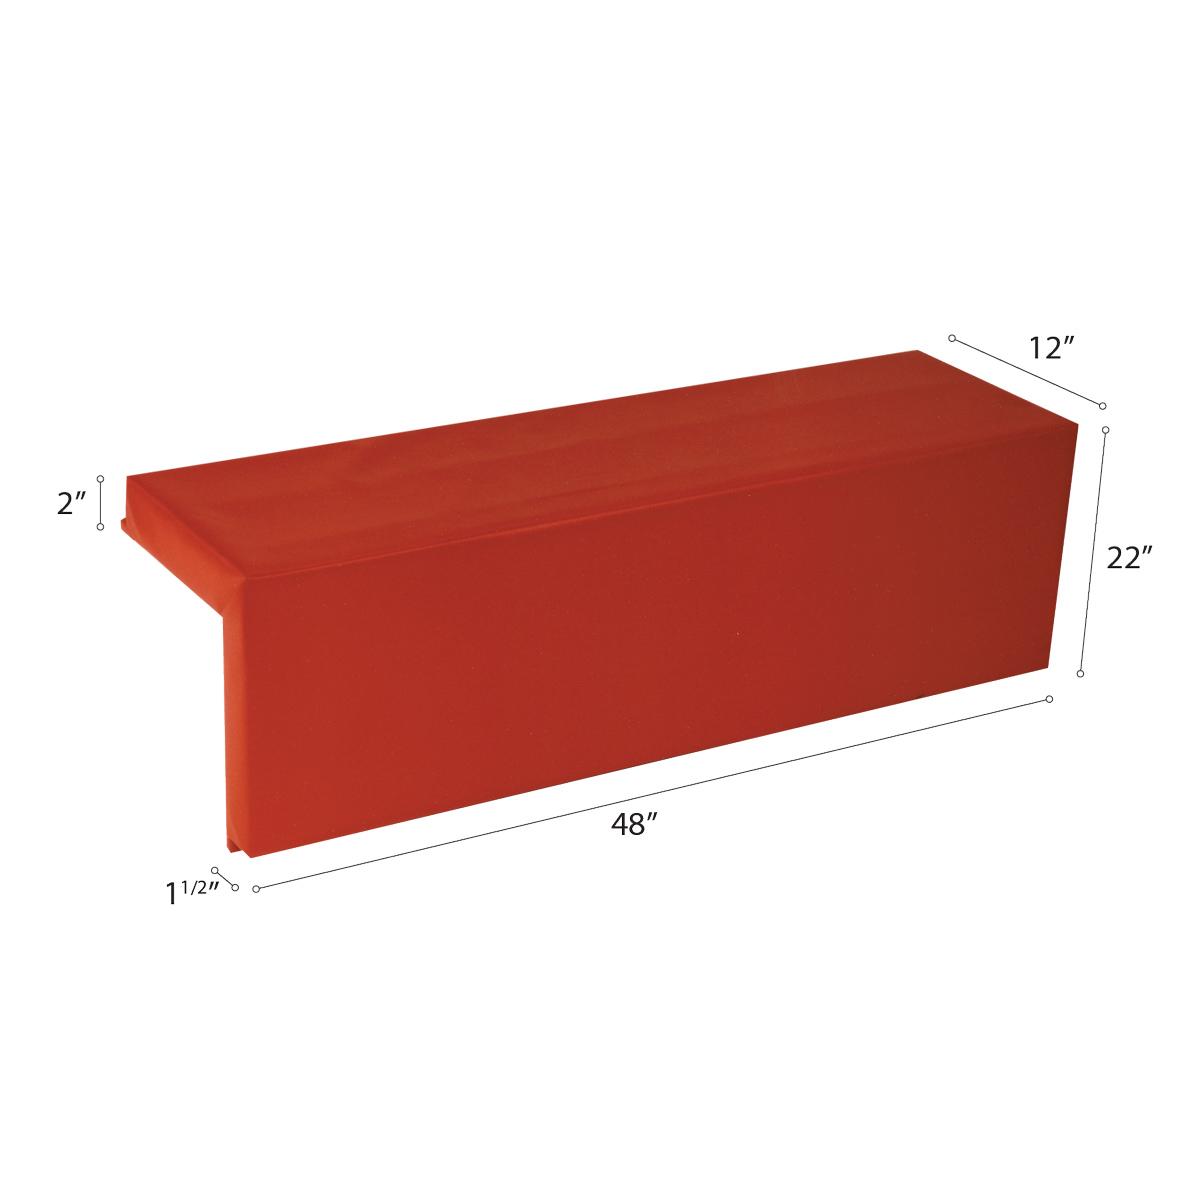 mancino mats landing foam pit pad